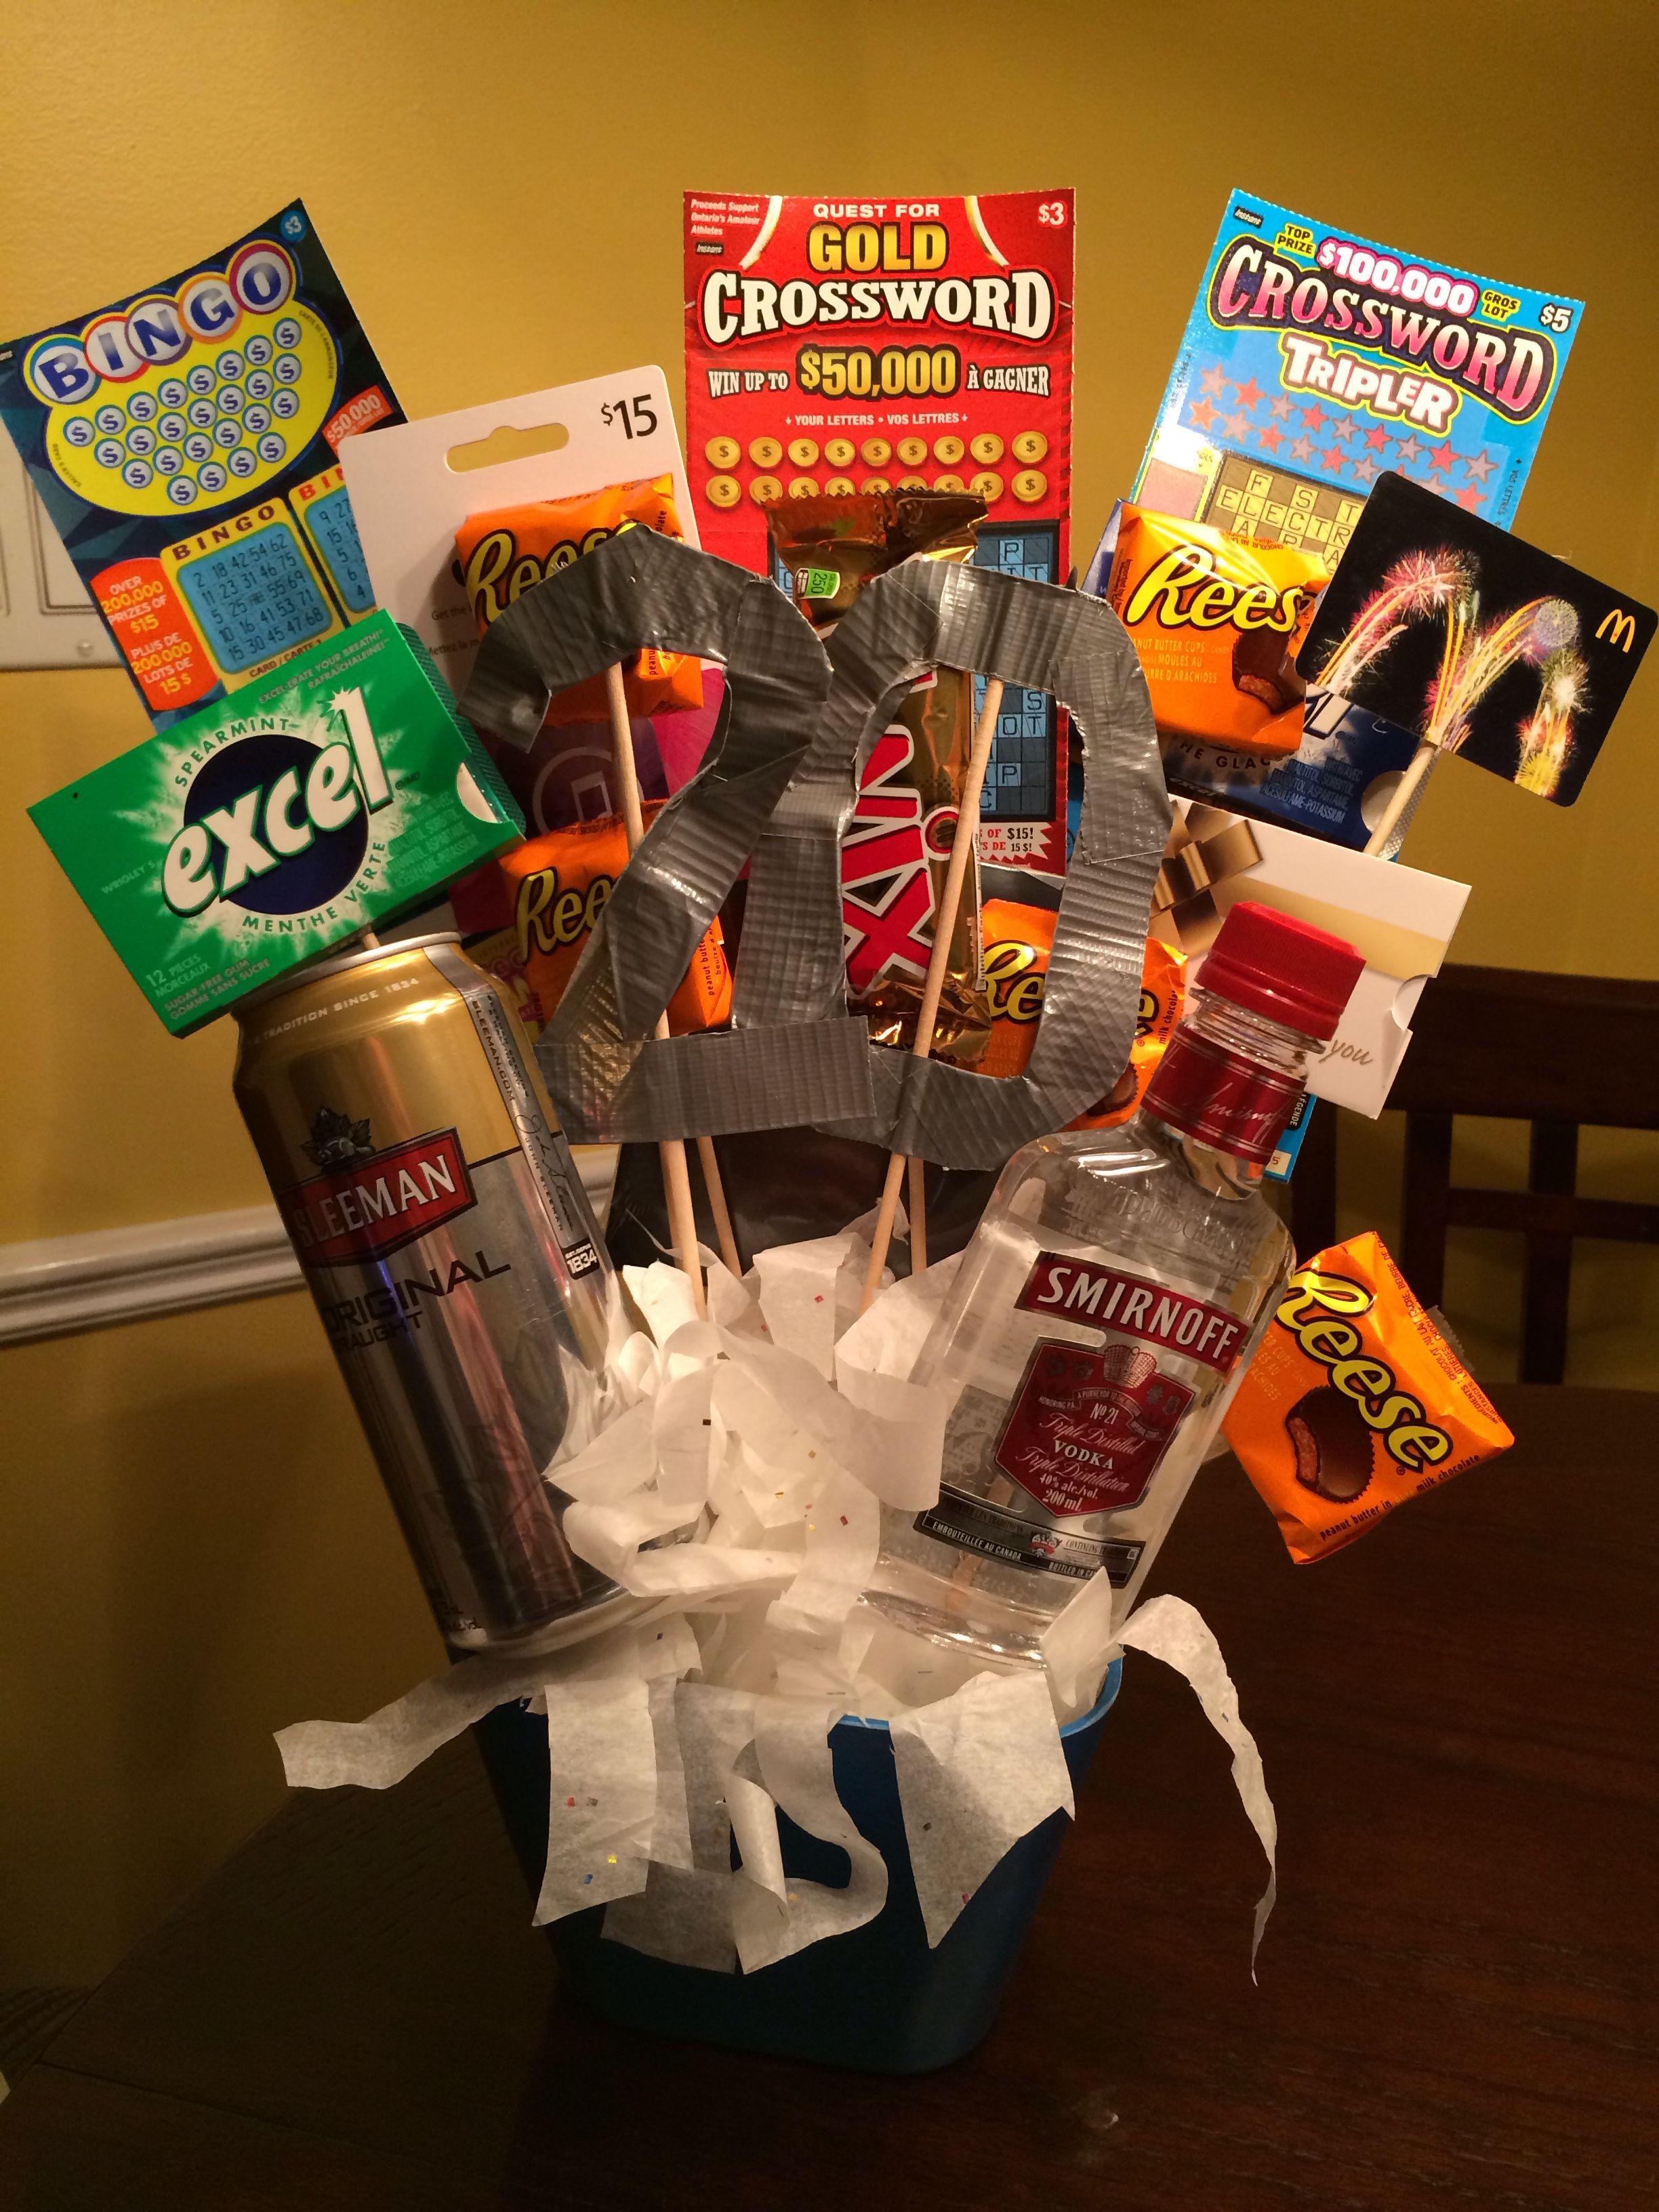 Gift ideas for boyfriend gift ideas for 20th birthday for for Presents for boyfriends birthday